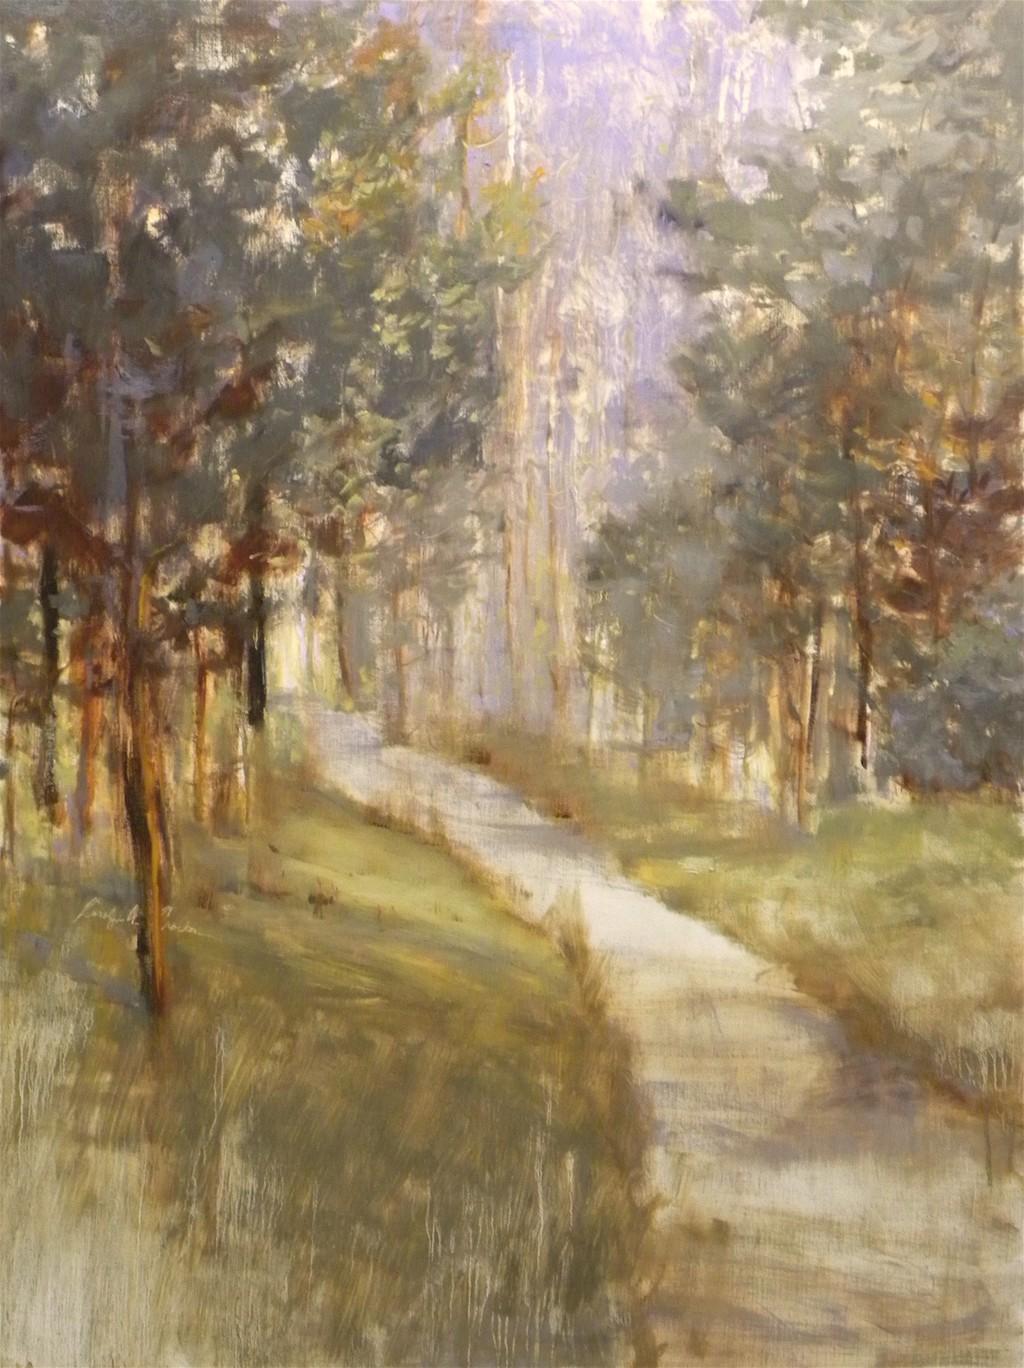 Late Summer Stroll  by Carolyn Anne Crocker